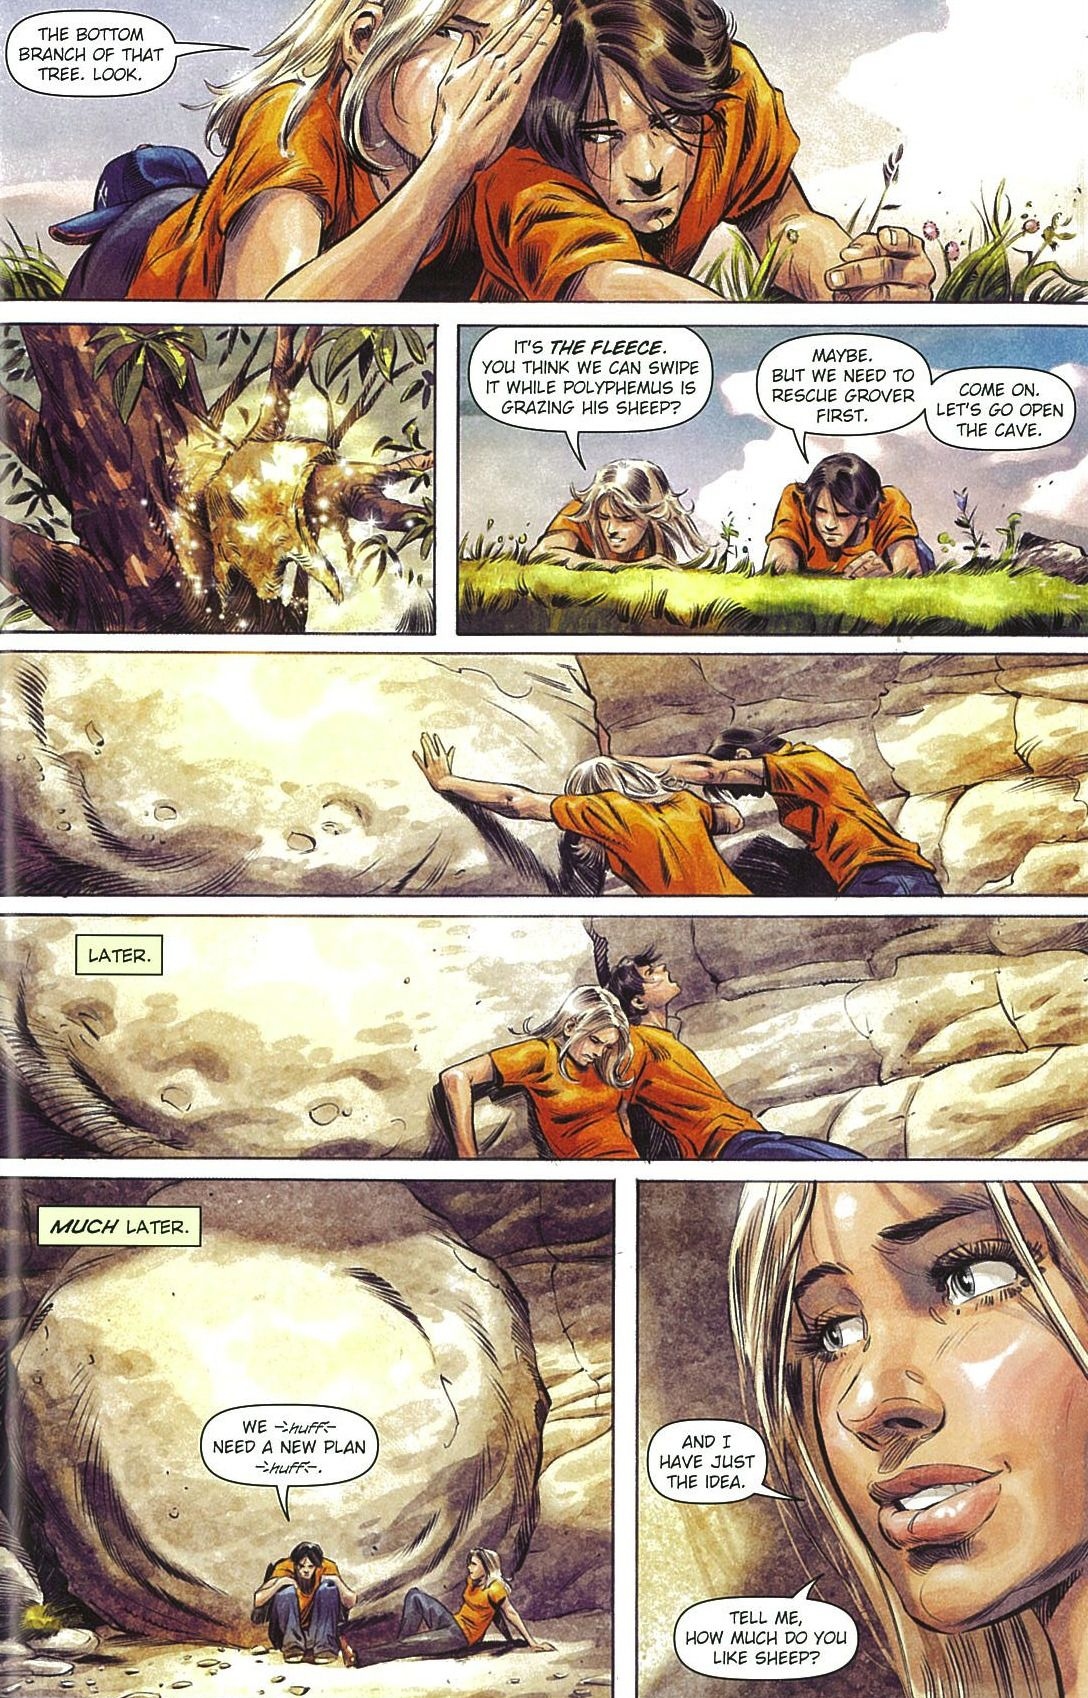 burdge on Tumblr |Percy Jackson Graphic Novel Annabeth